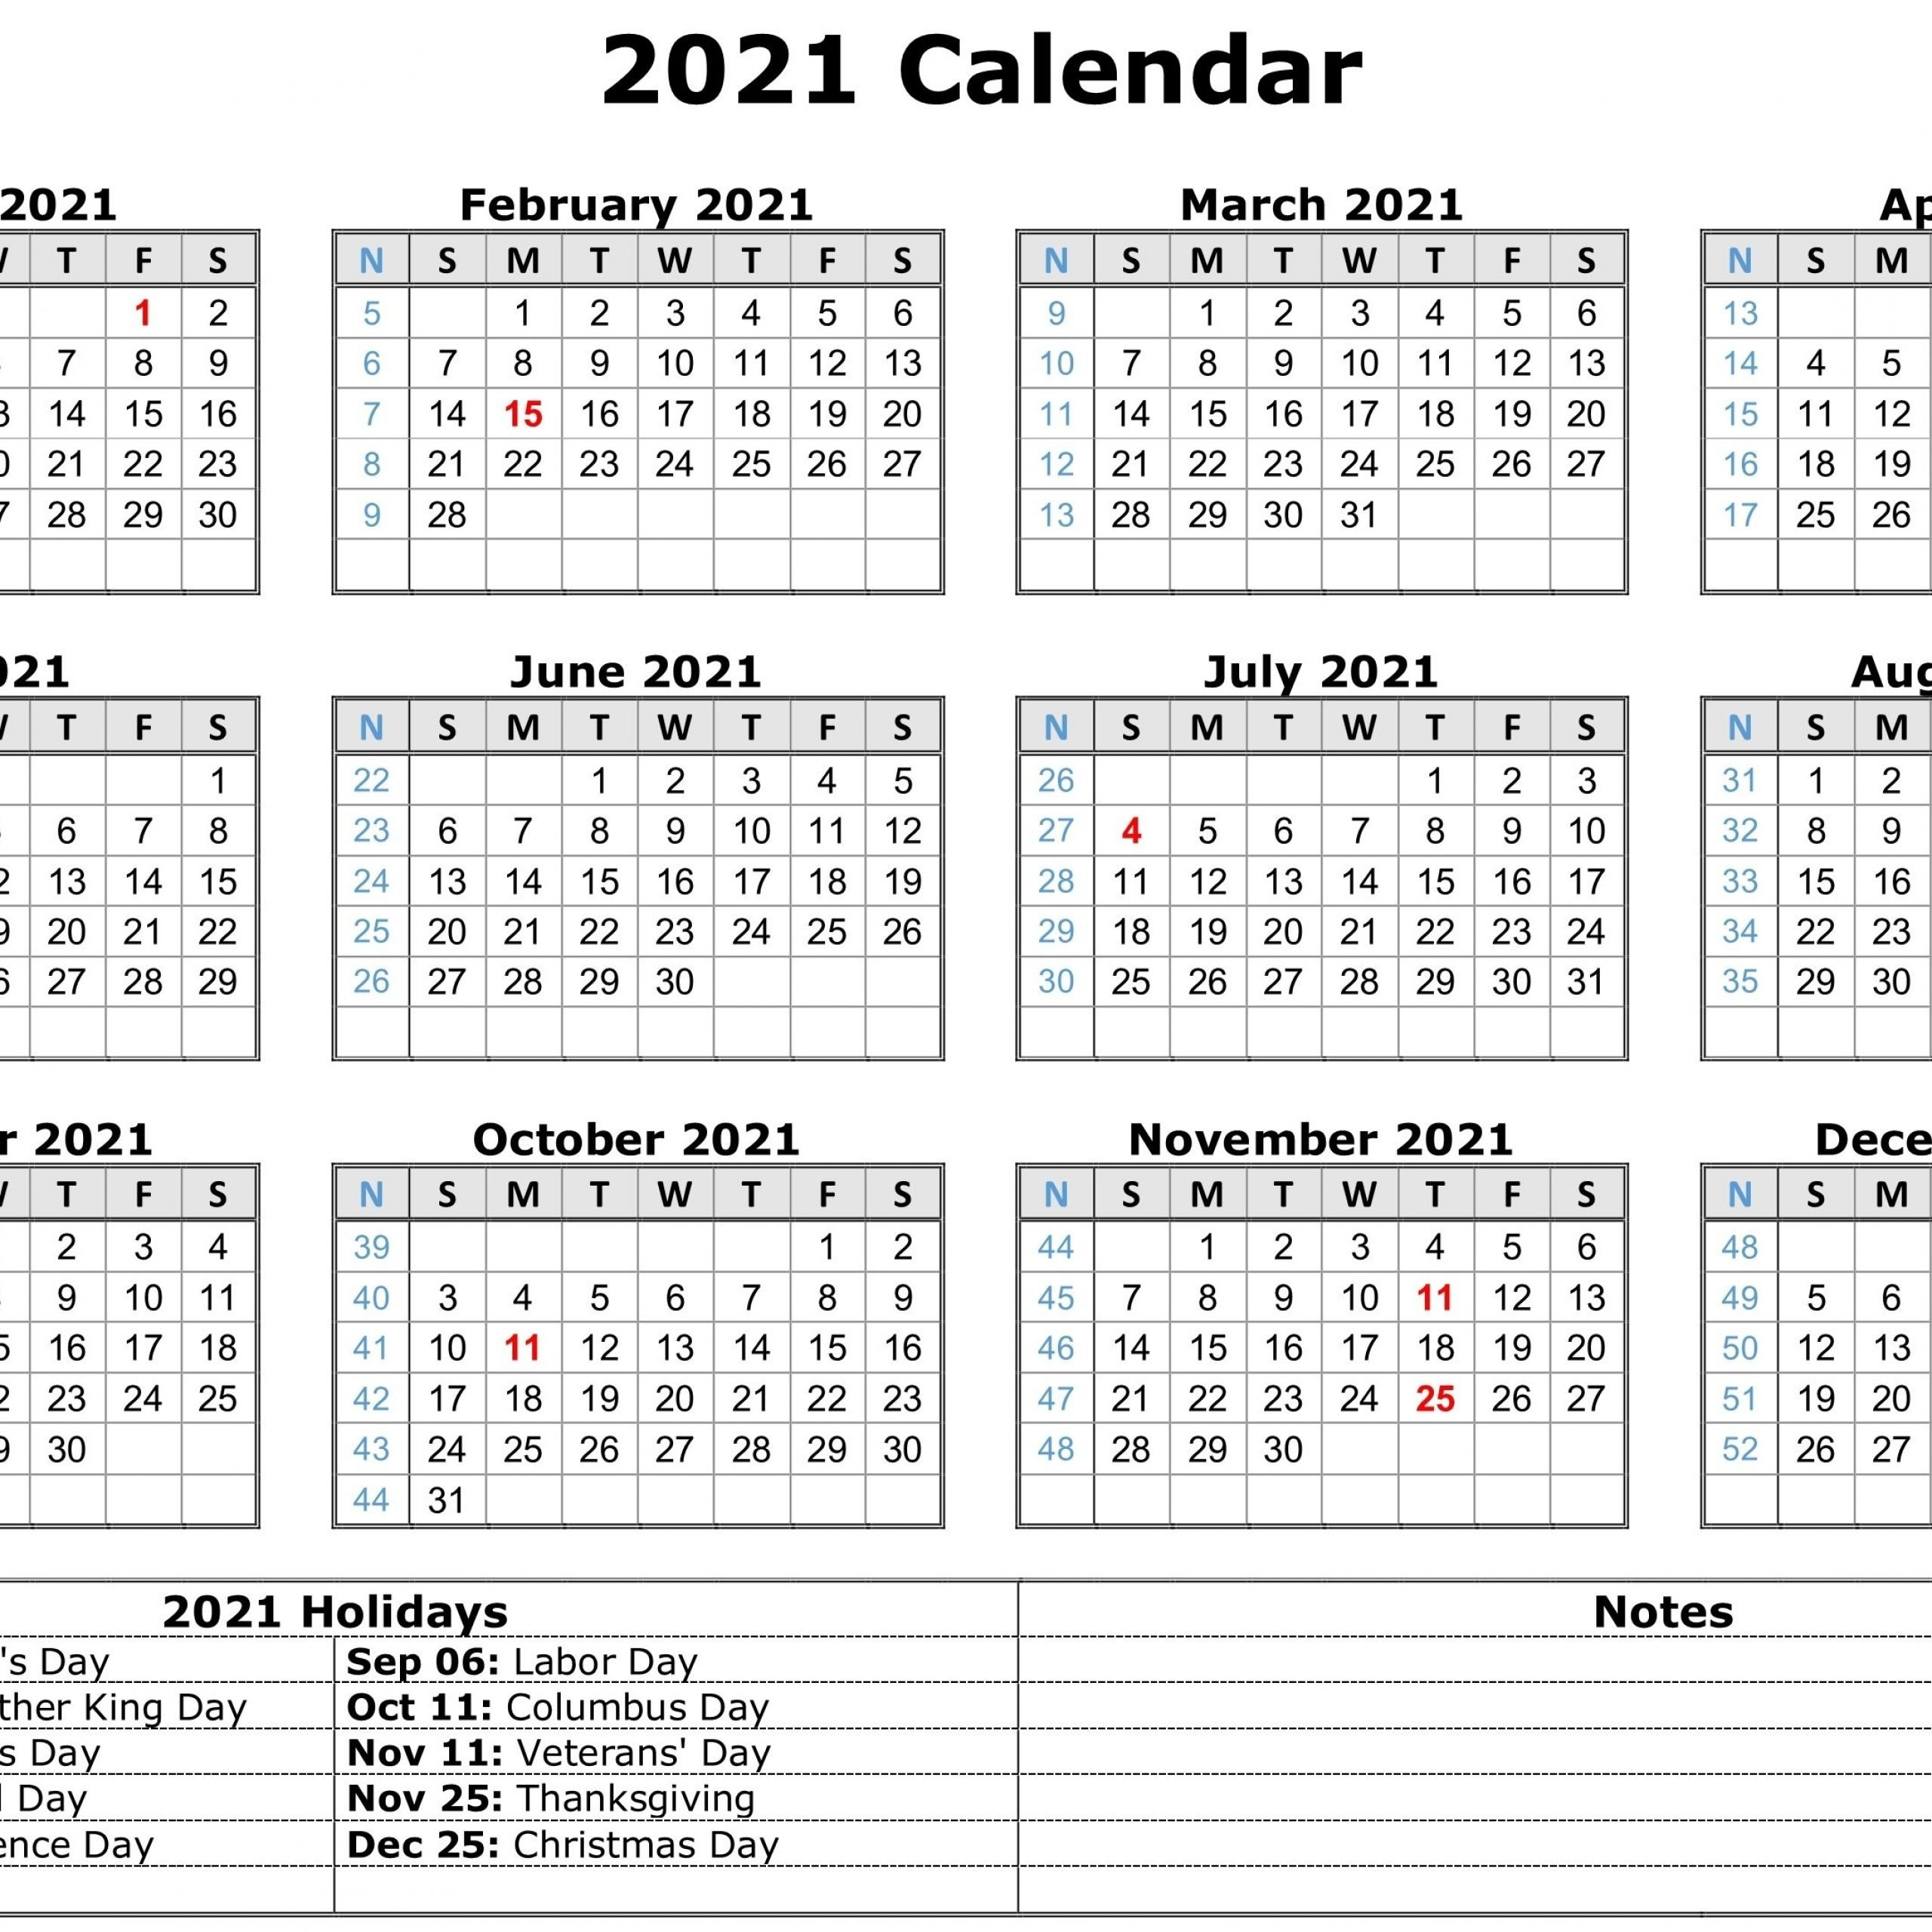 Printable Calendar 2021 With Holidays Pdf   Free Printable Calendar 2021 within 2021 Calendar Philippine Holidays Photo